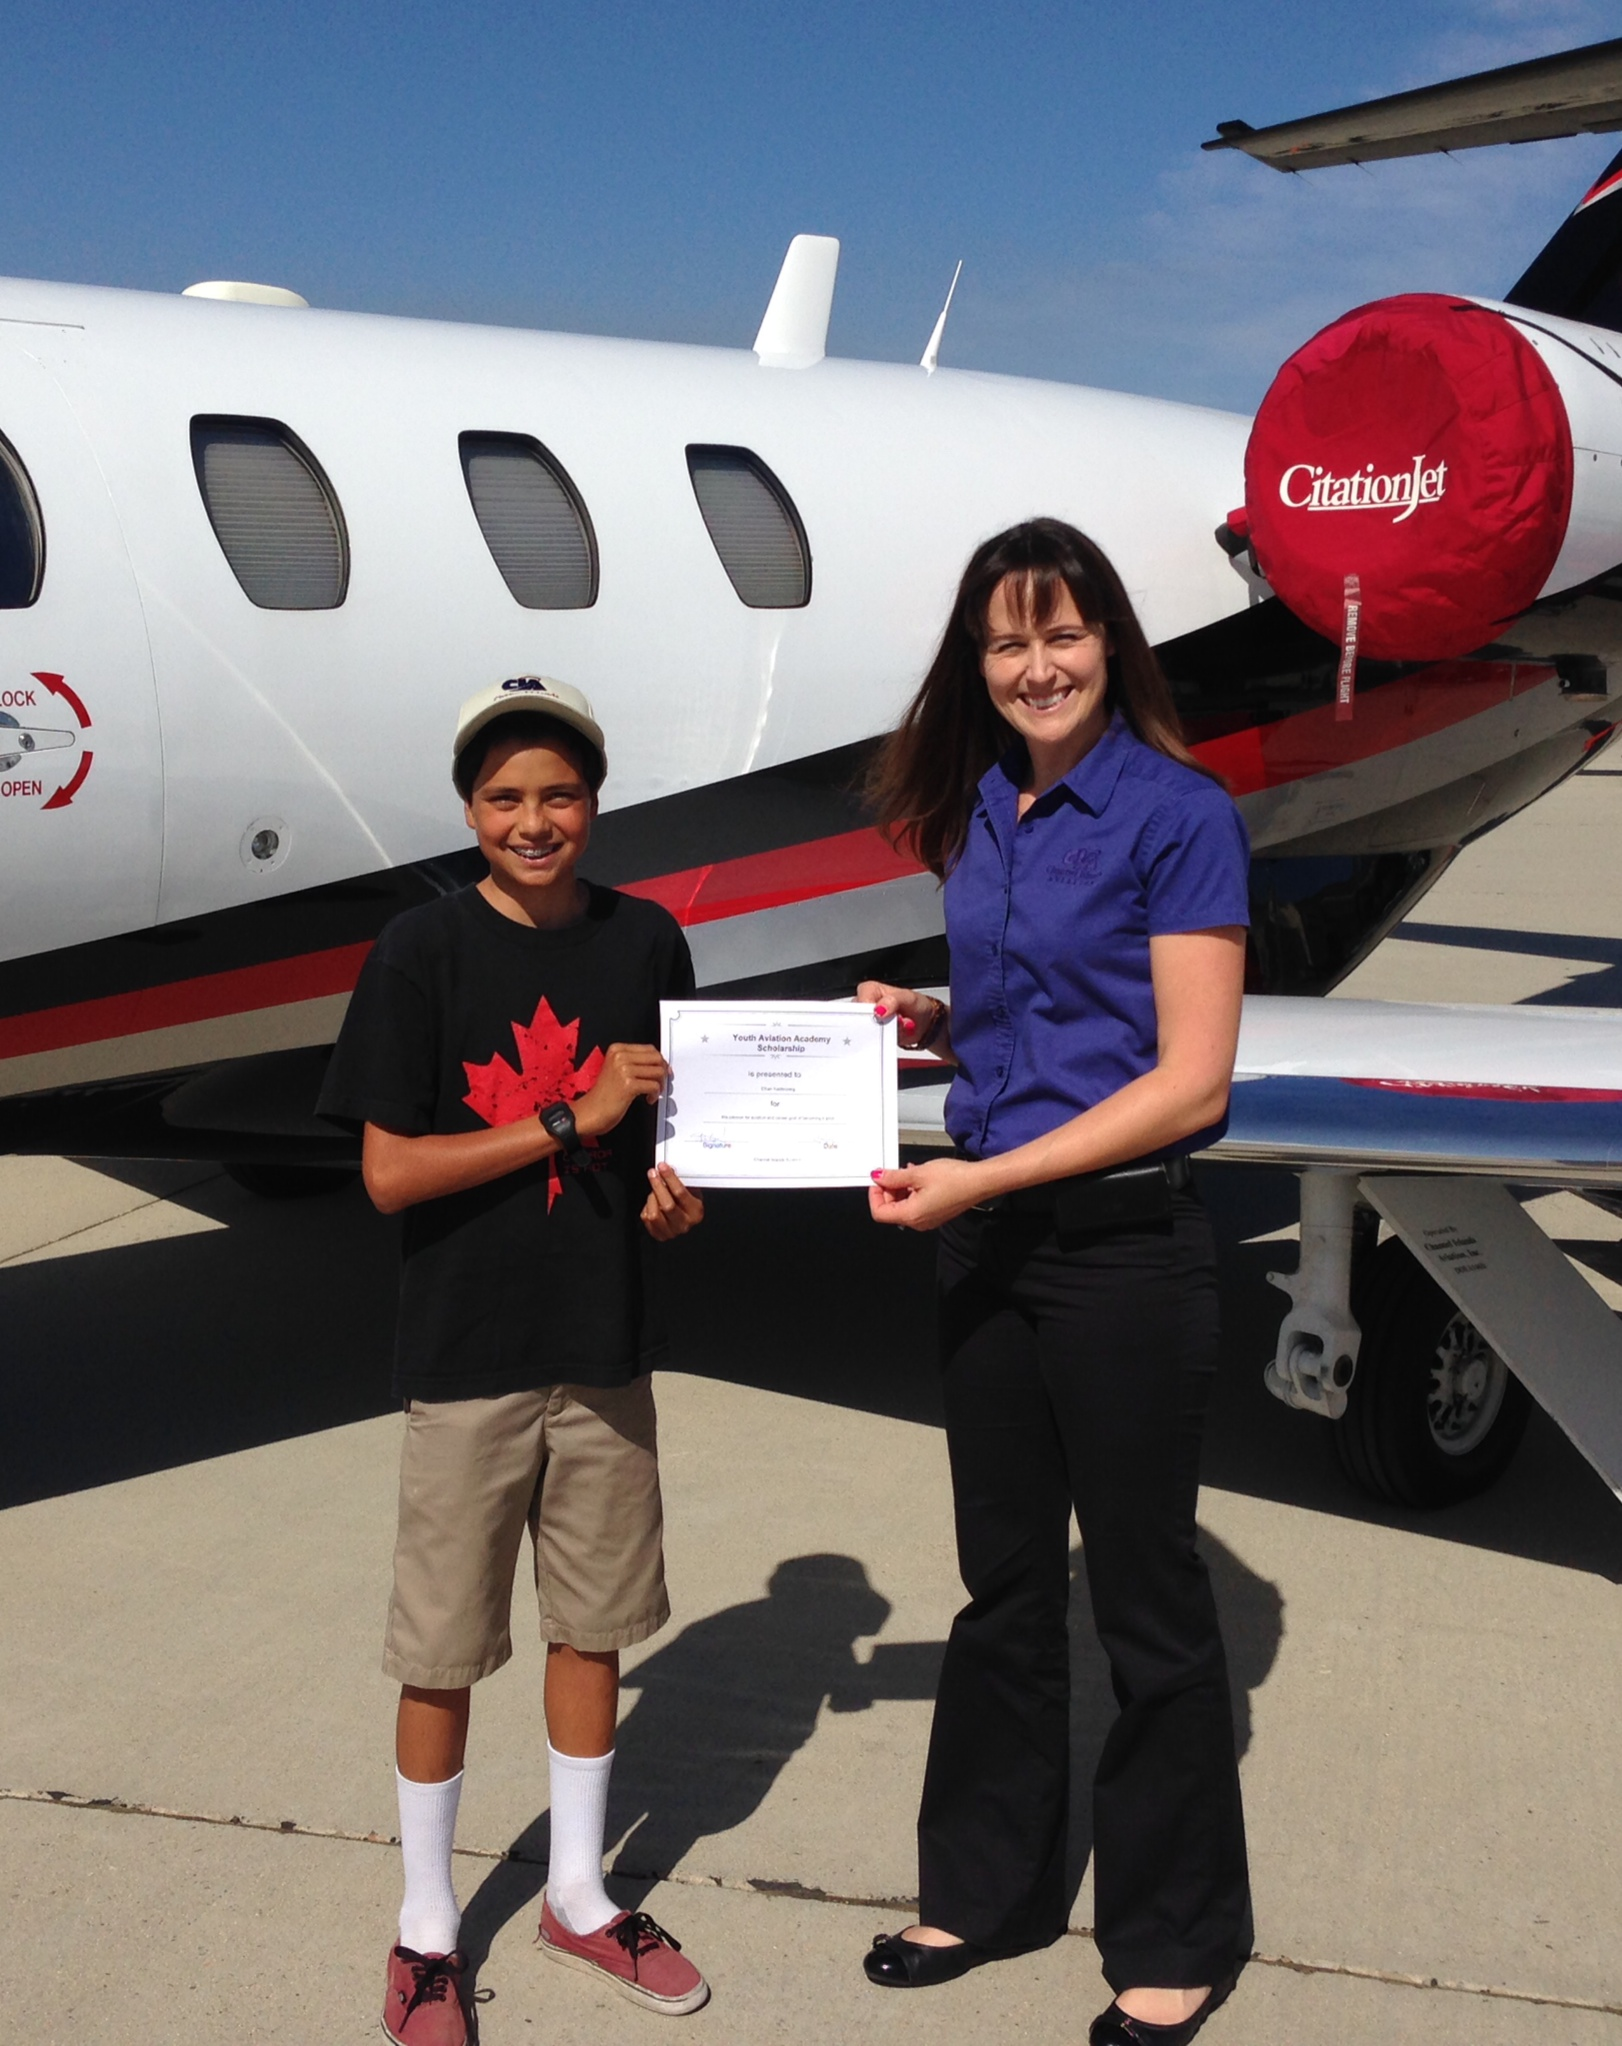 Ethan Kastenberg, 12, receives scholarship from Sarah Oberman Bartush, flight school manager.